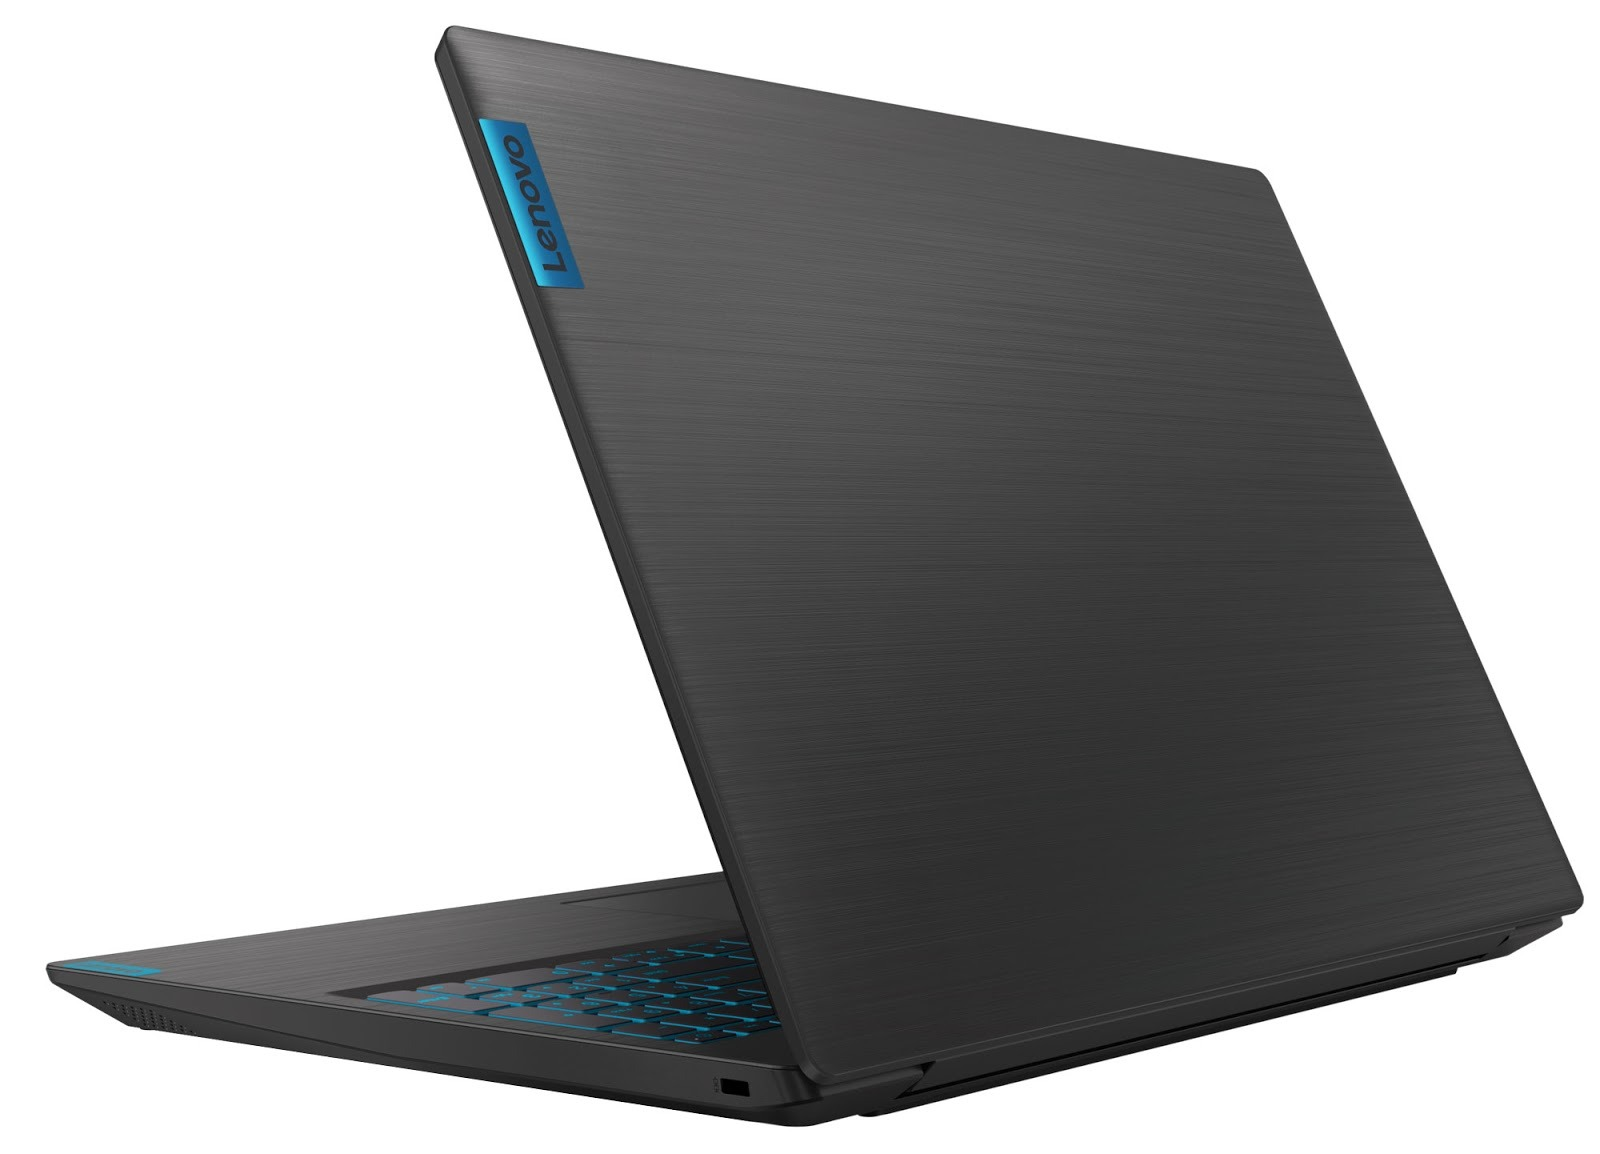 Фото 4. Ноутбук Lenovo ideapad L340-17IRH Gaming Granite Black(81LL003SRK)